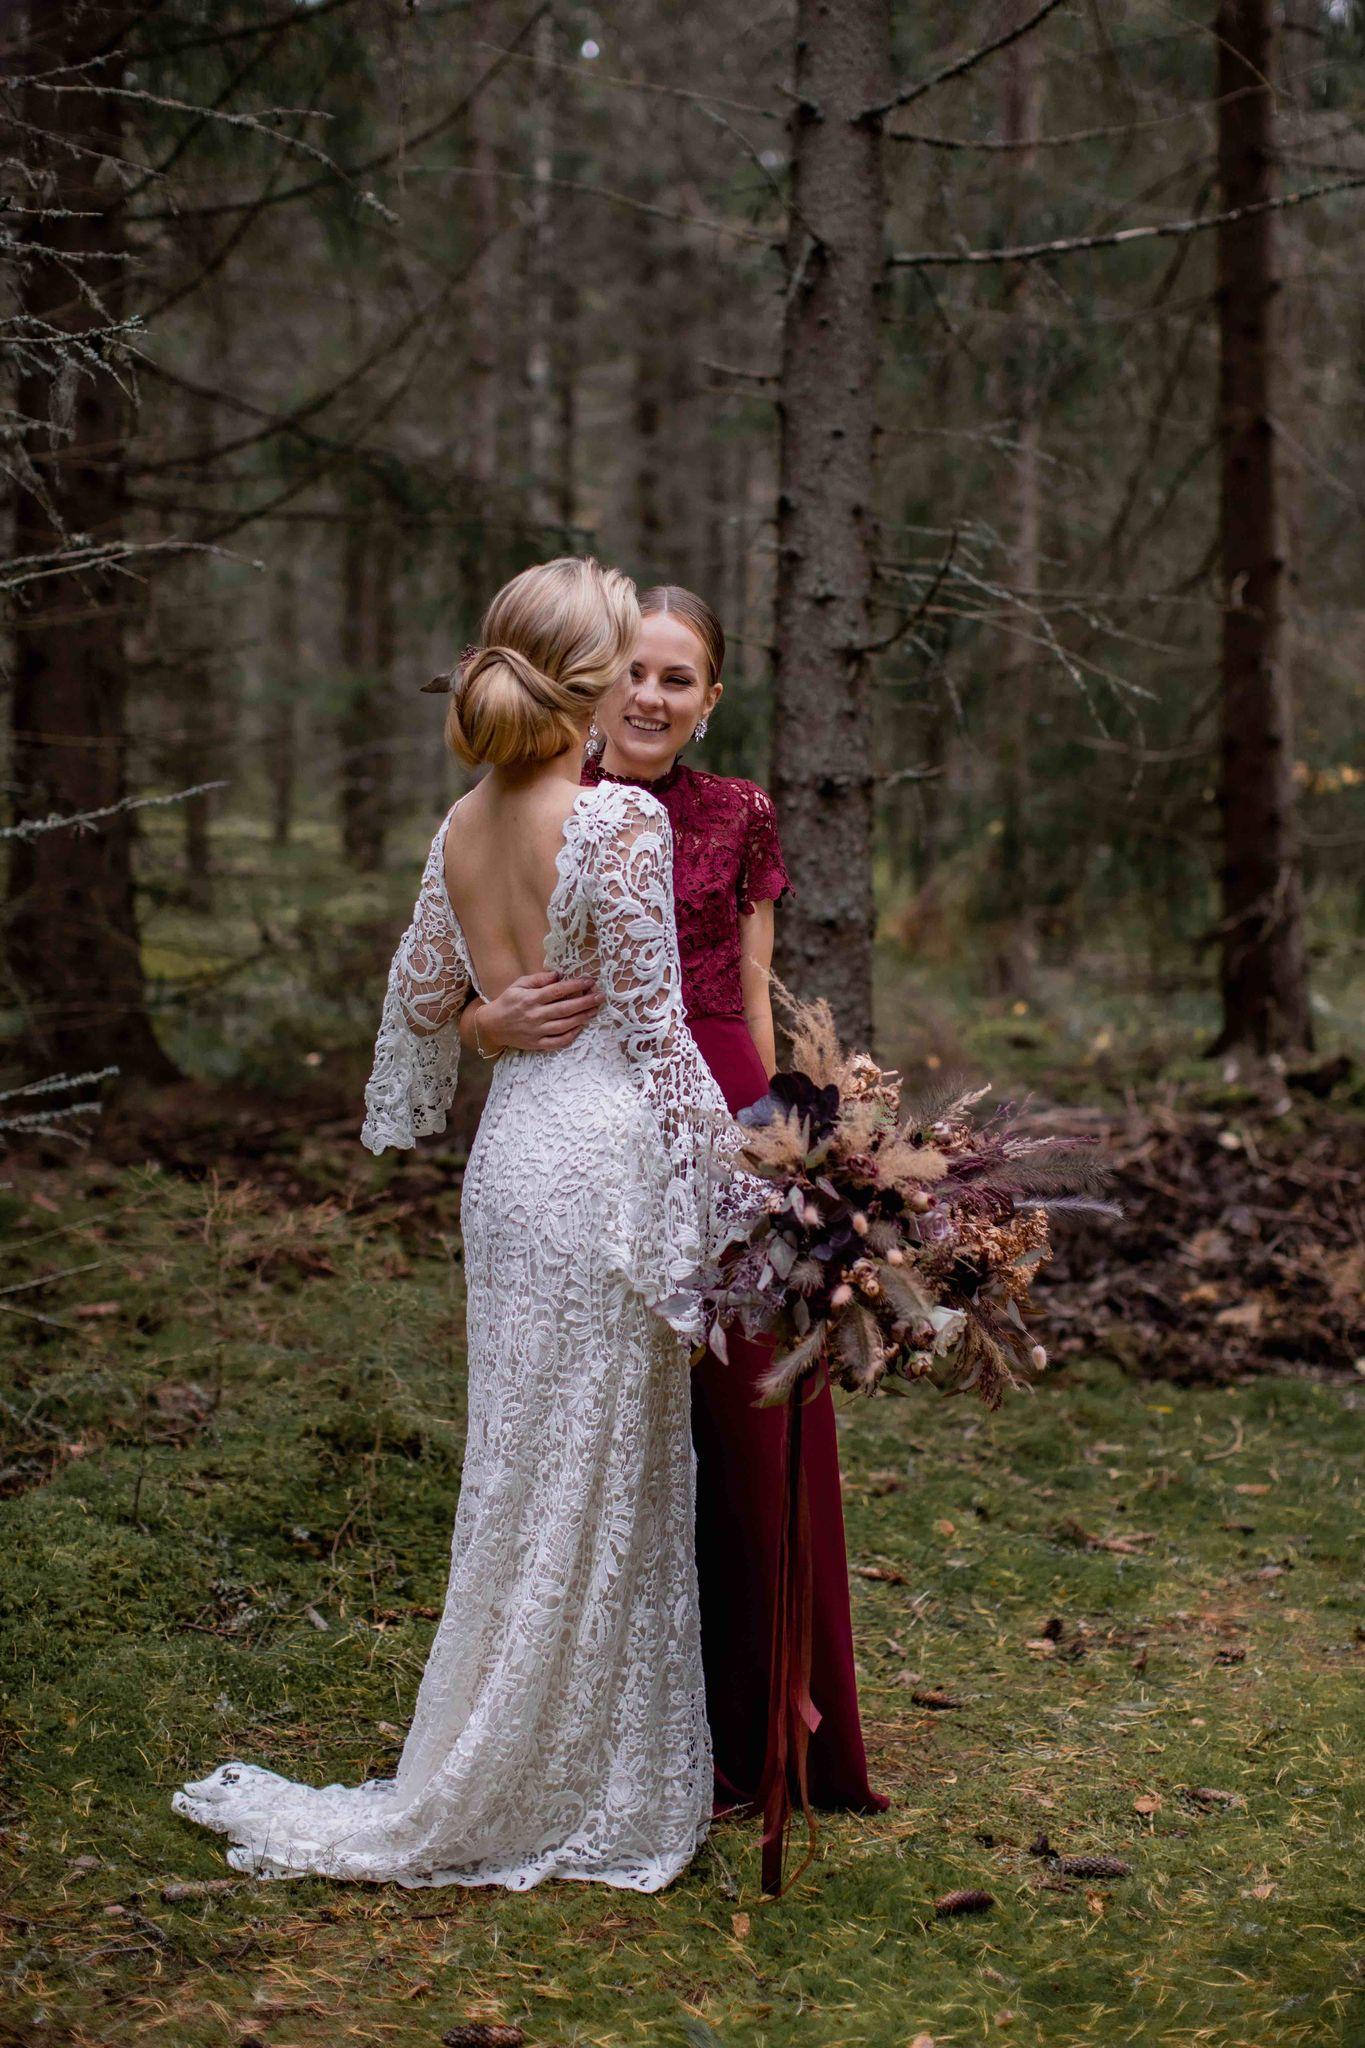 Fotograf: Julia Viklund